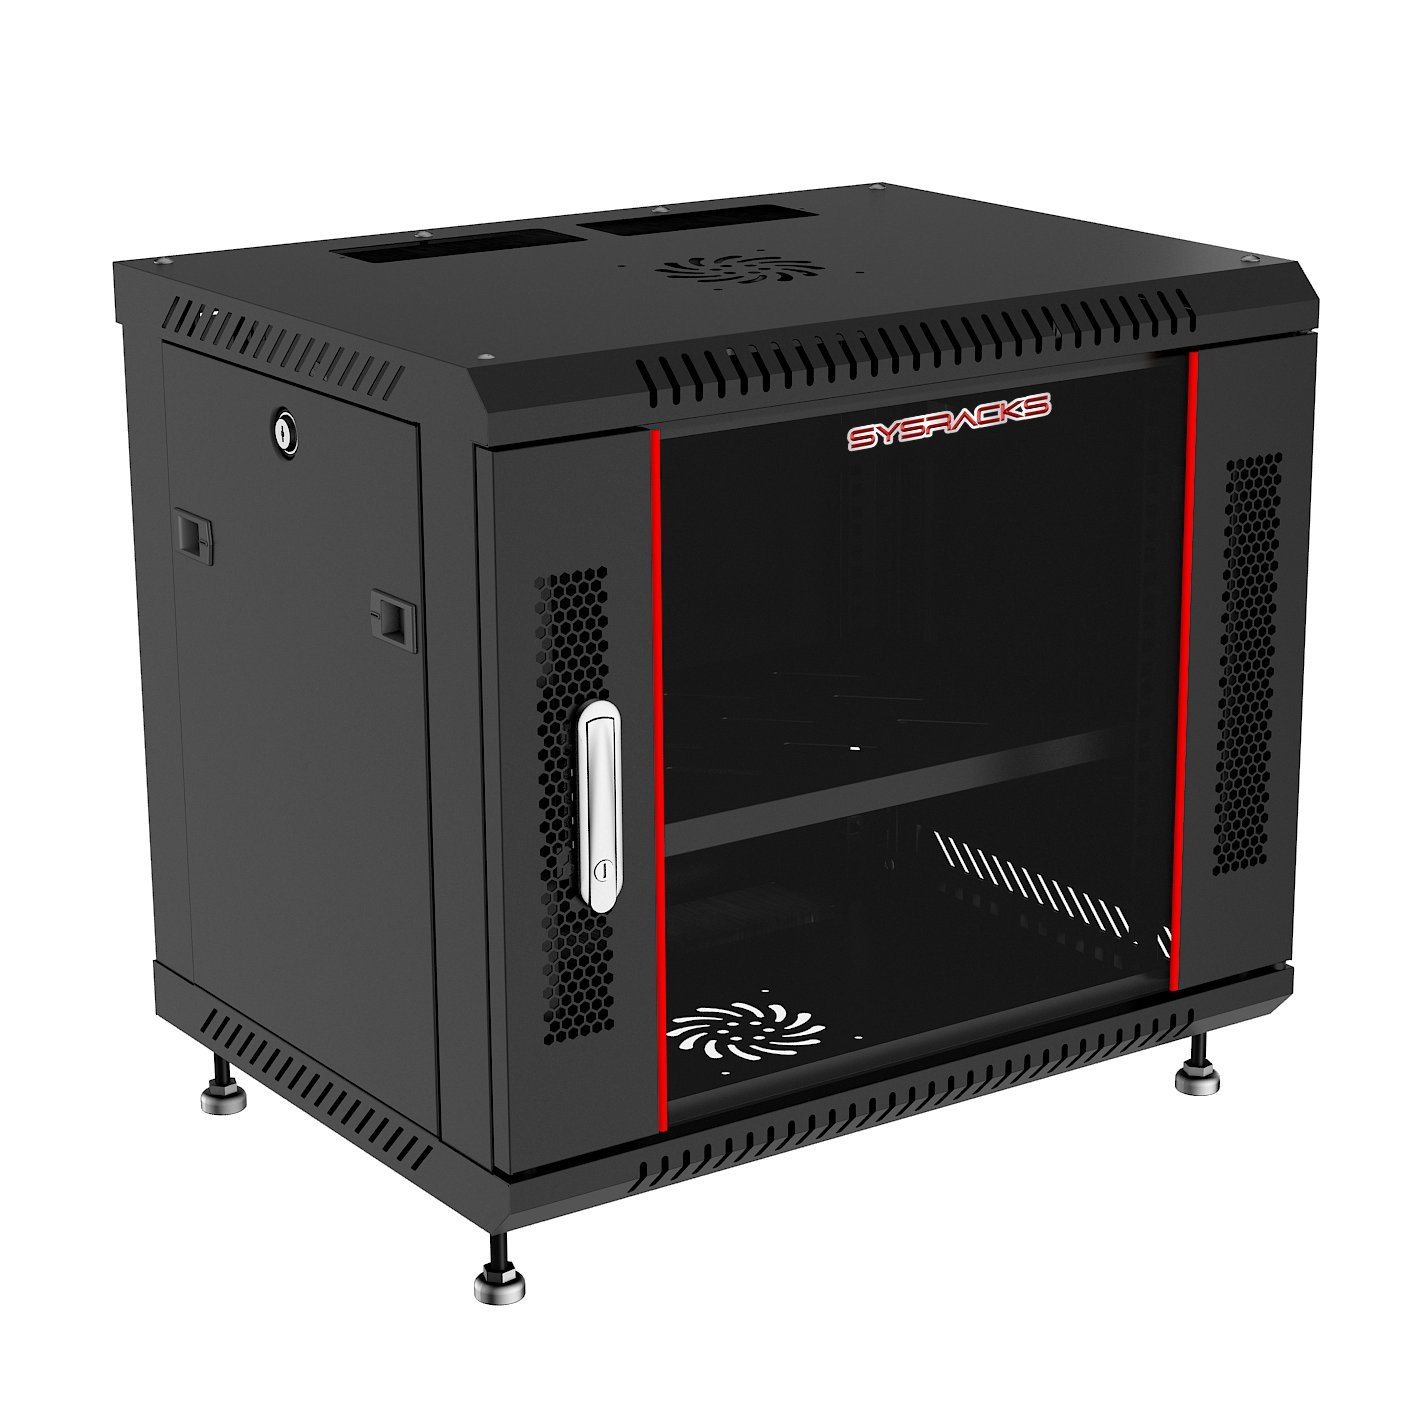 9U18in Depth Wall Mount Server Rack Cabinet(24' w x18 d x20 h)(600x450x496mm.) Glass Door(1 Fan, 1 Shelf, 4 Feet, 1 Cable Entries)-Free!!! SYSRACKS 4328519886